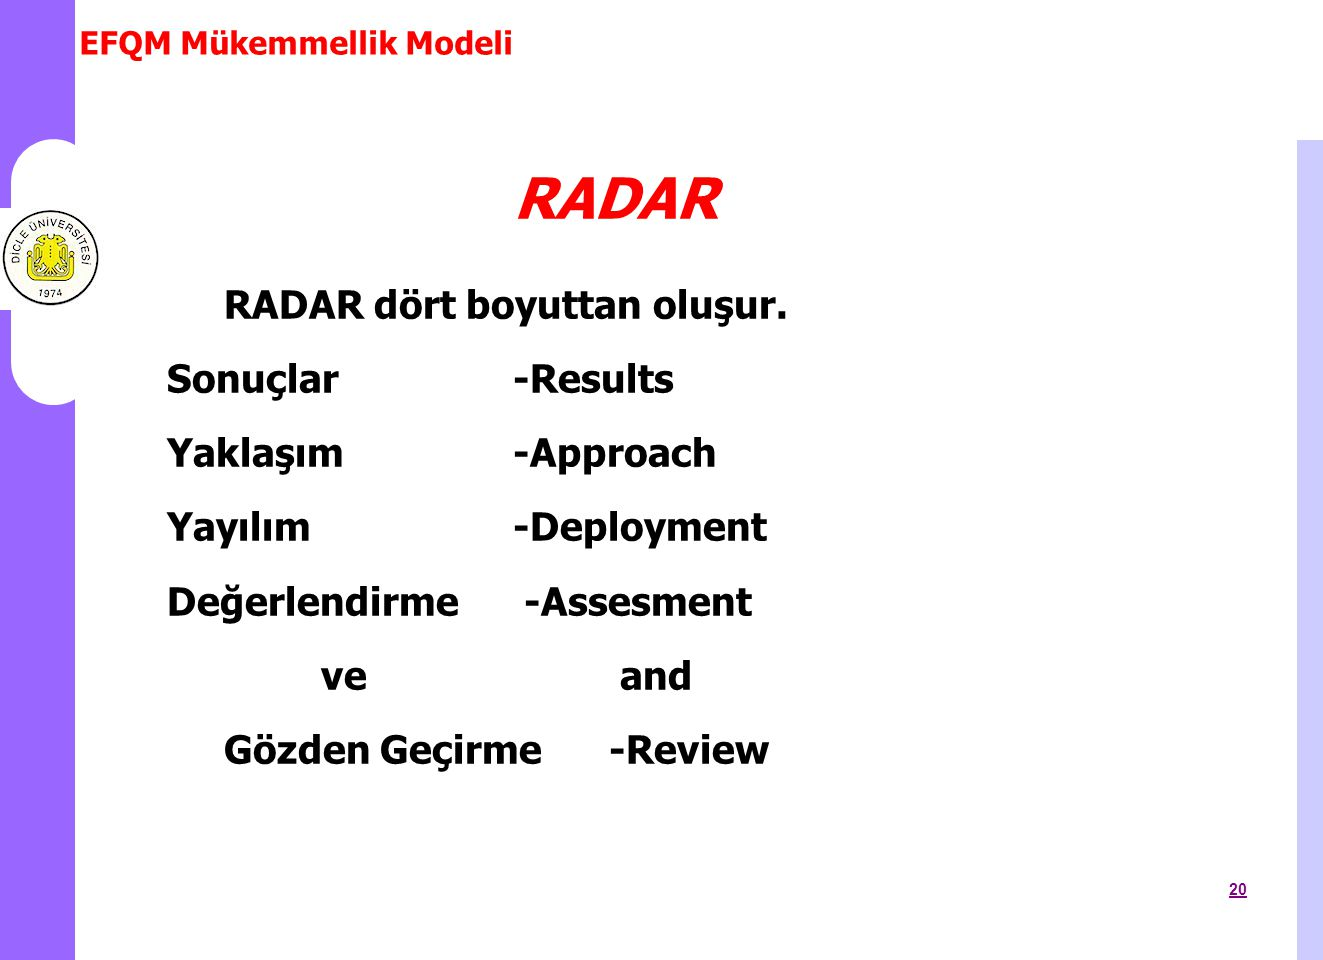 RADAR RADAR dört boyuttan oluşur. Sonuçlar -Results Yaklaşım -Approach